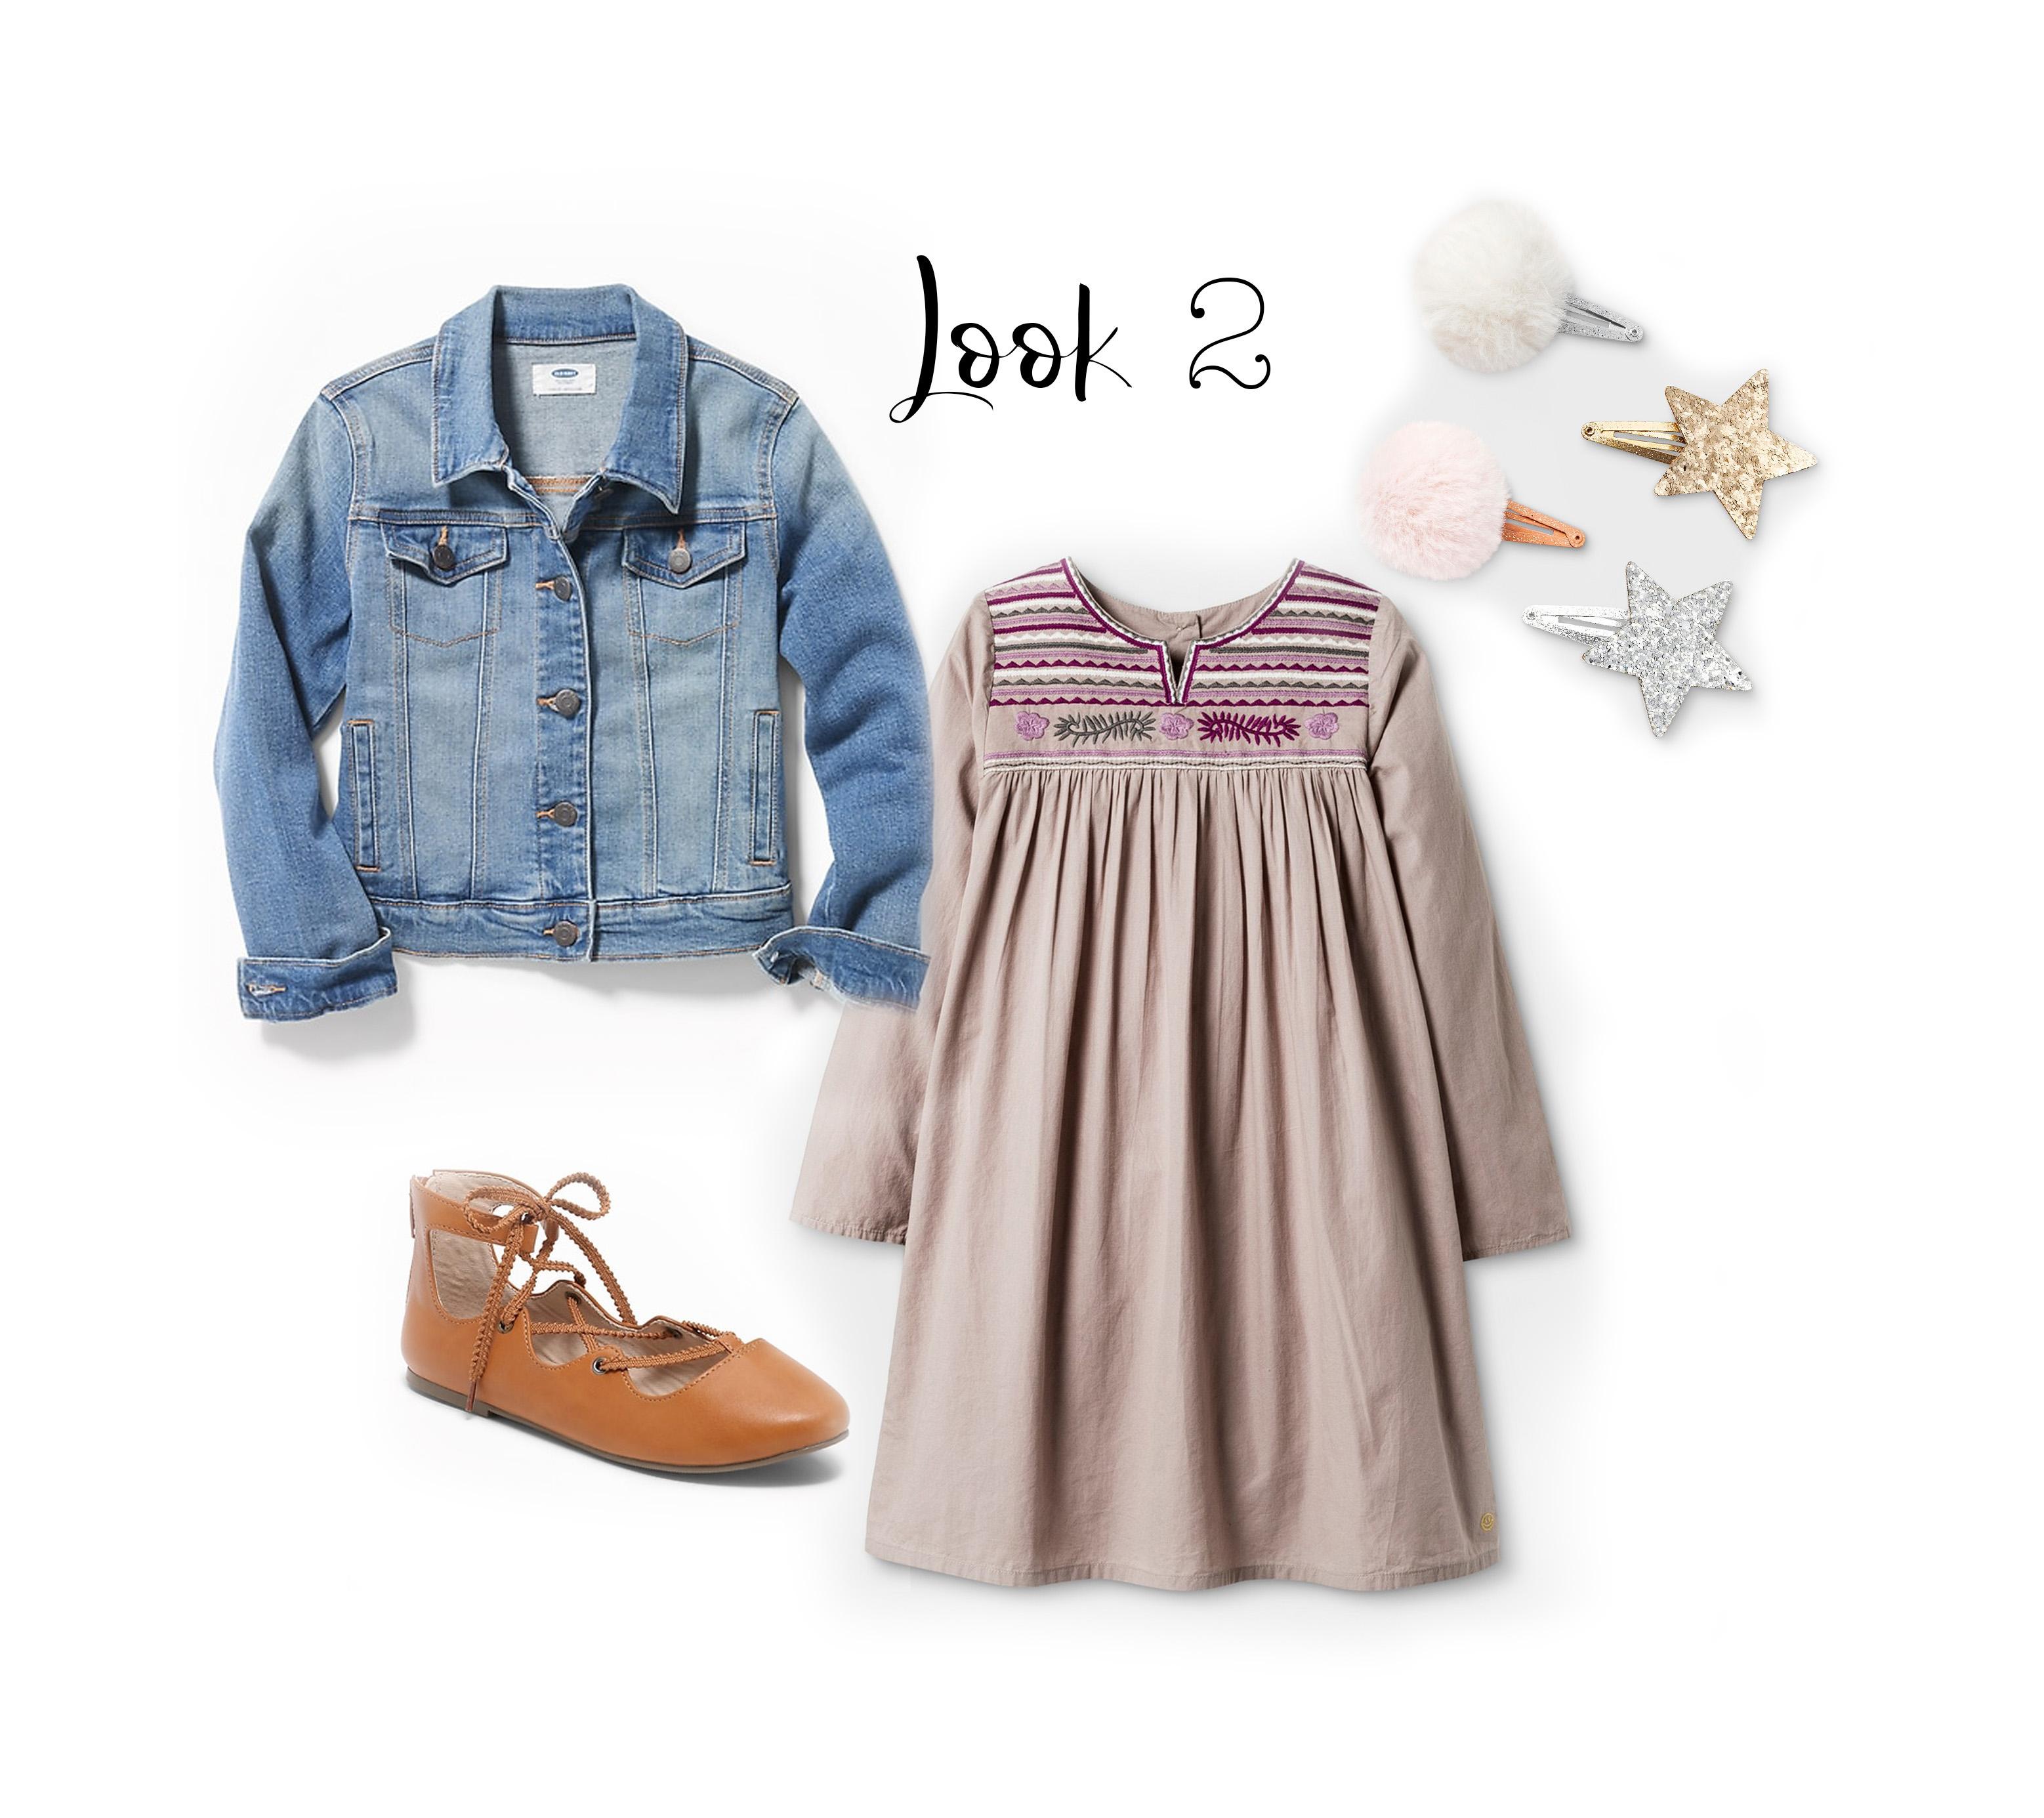 Cute Outfits for Older Girls – Jordan \u0026 Co